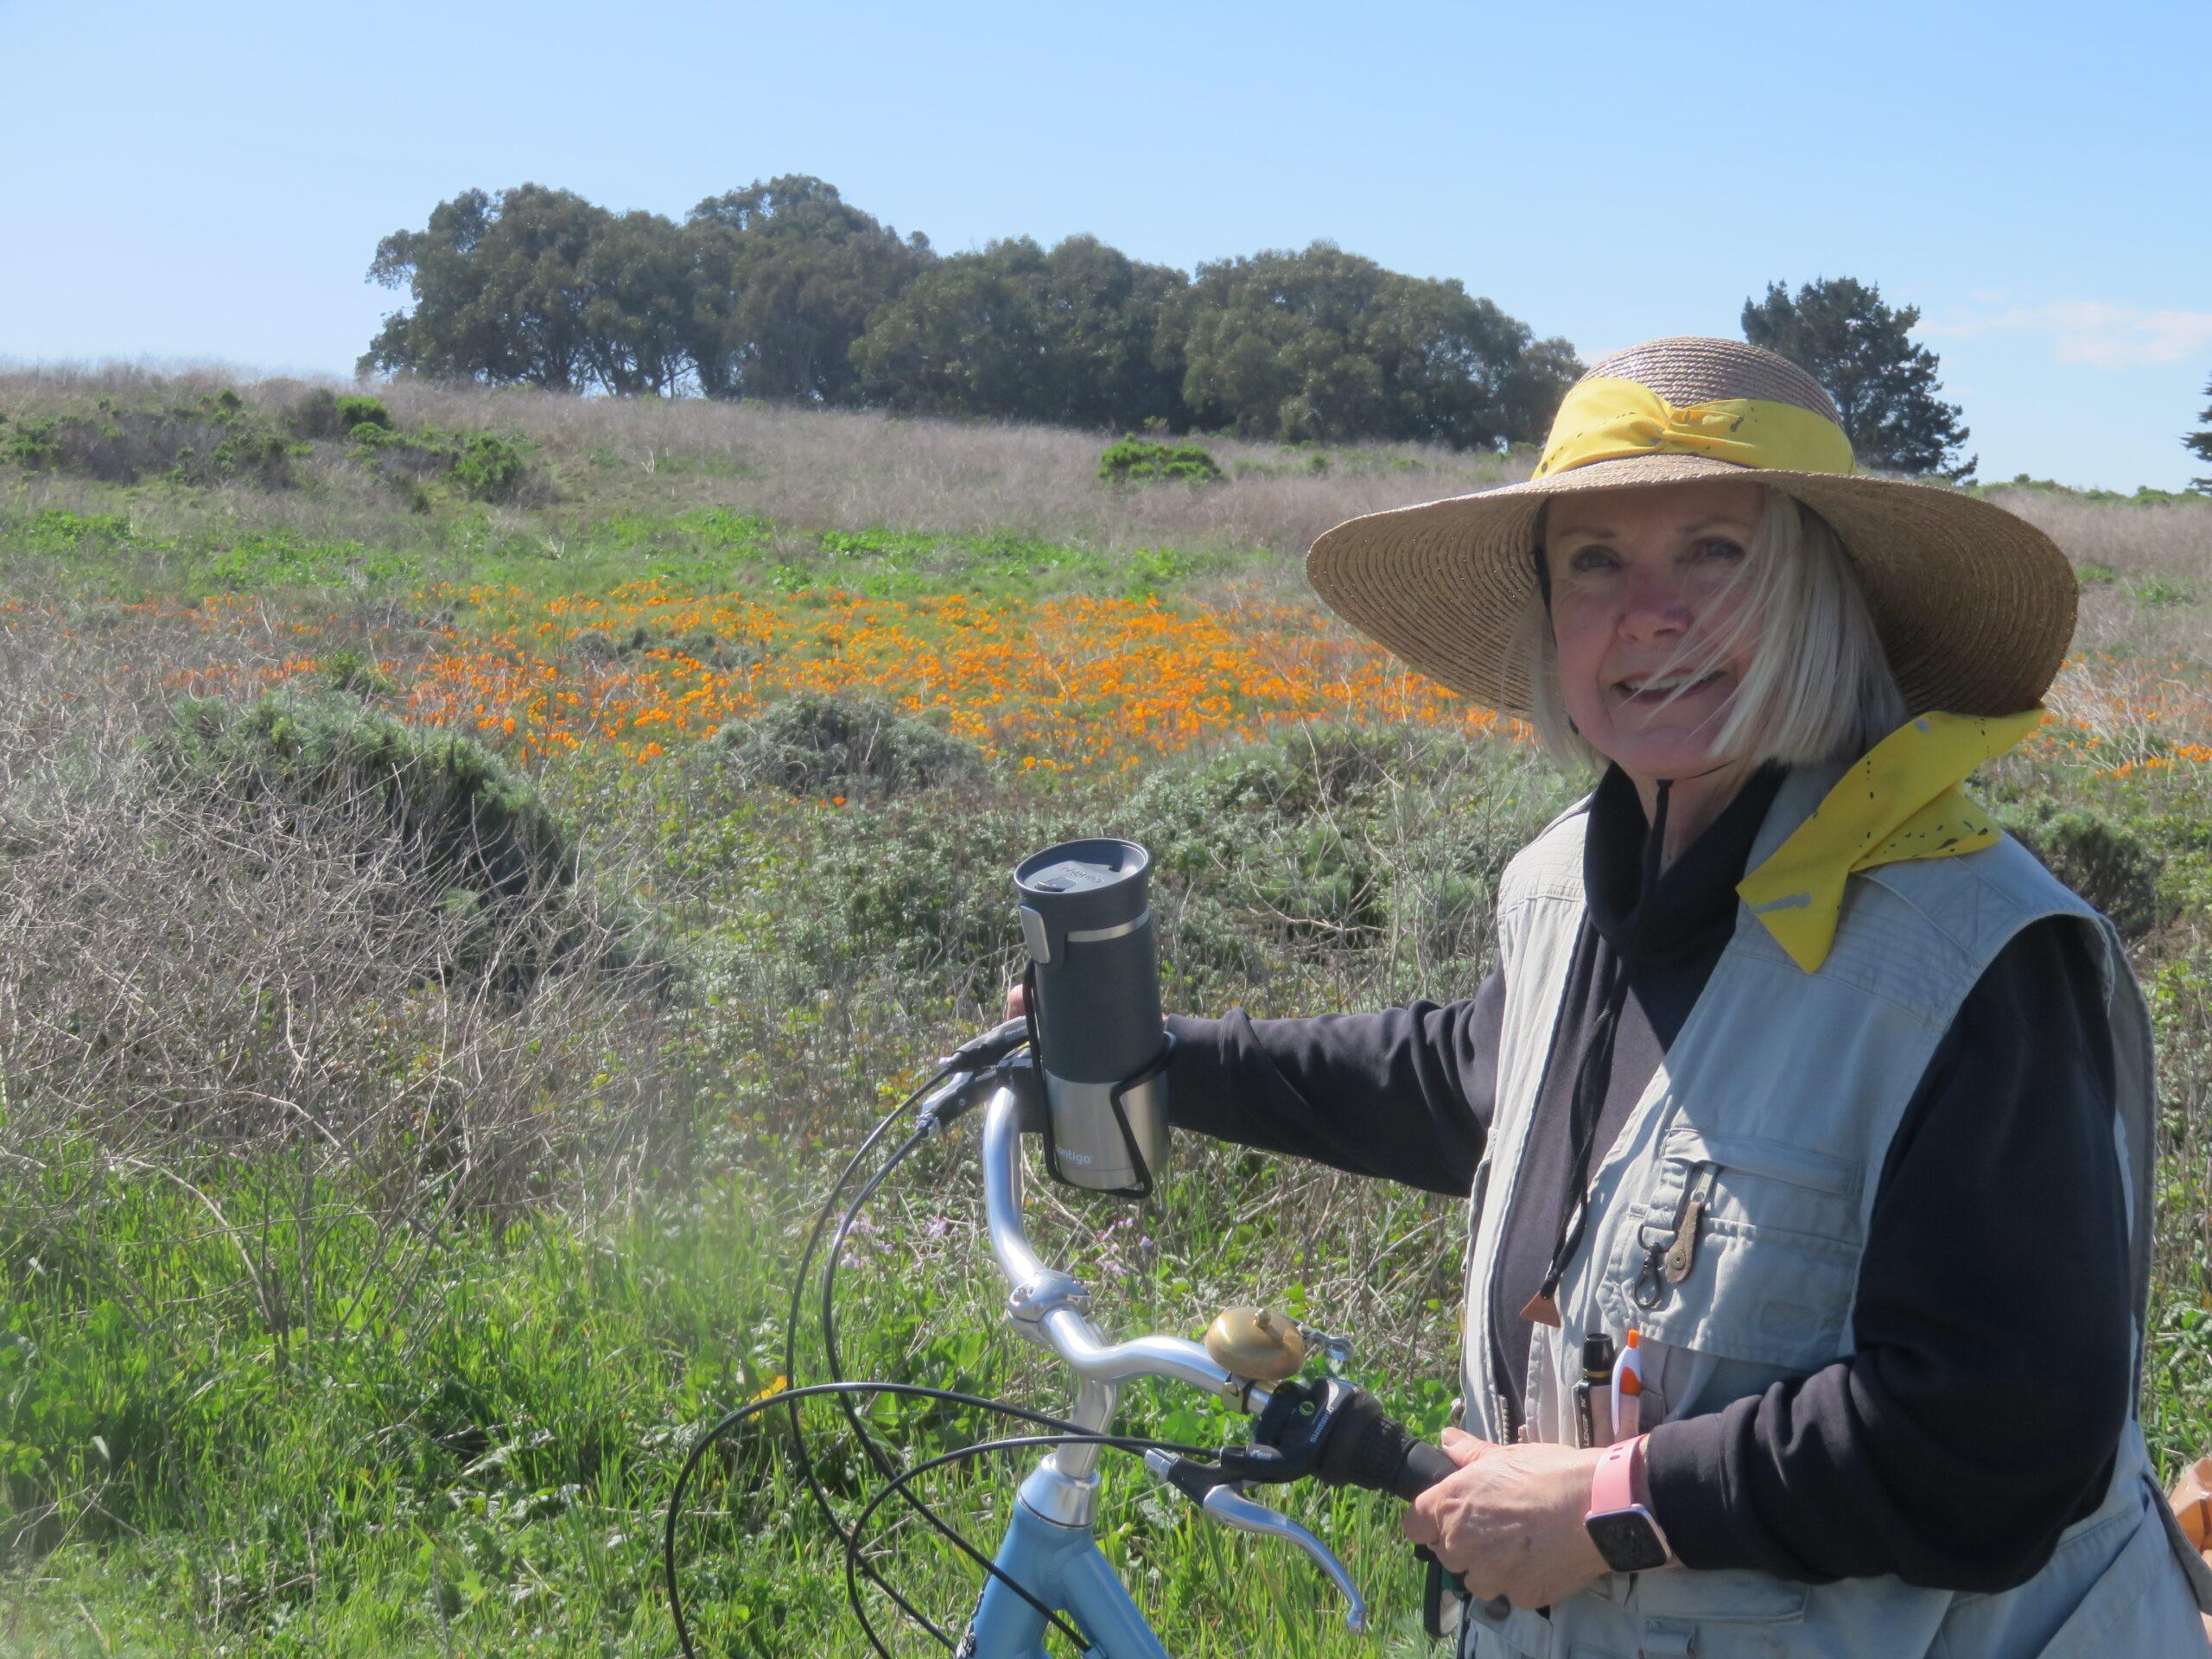 The Cycling Painter Anita Hampton